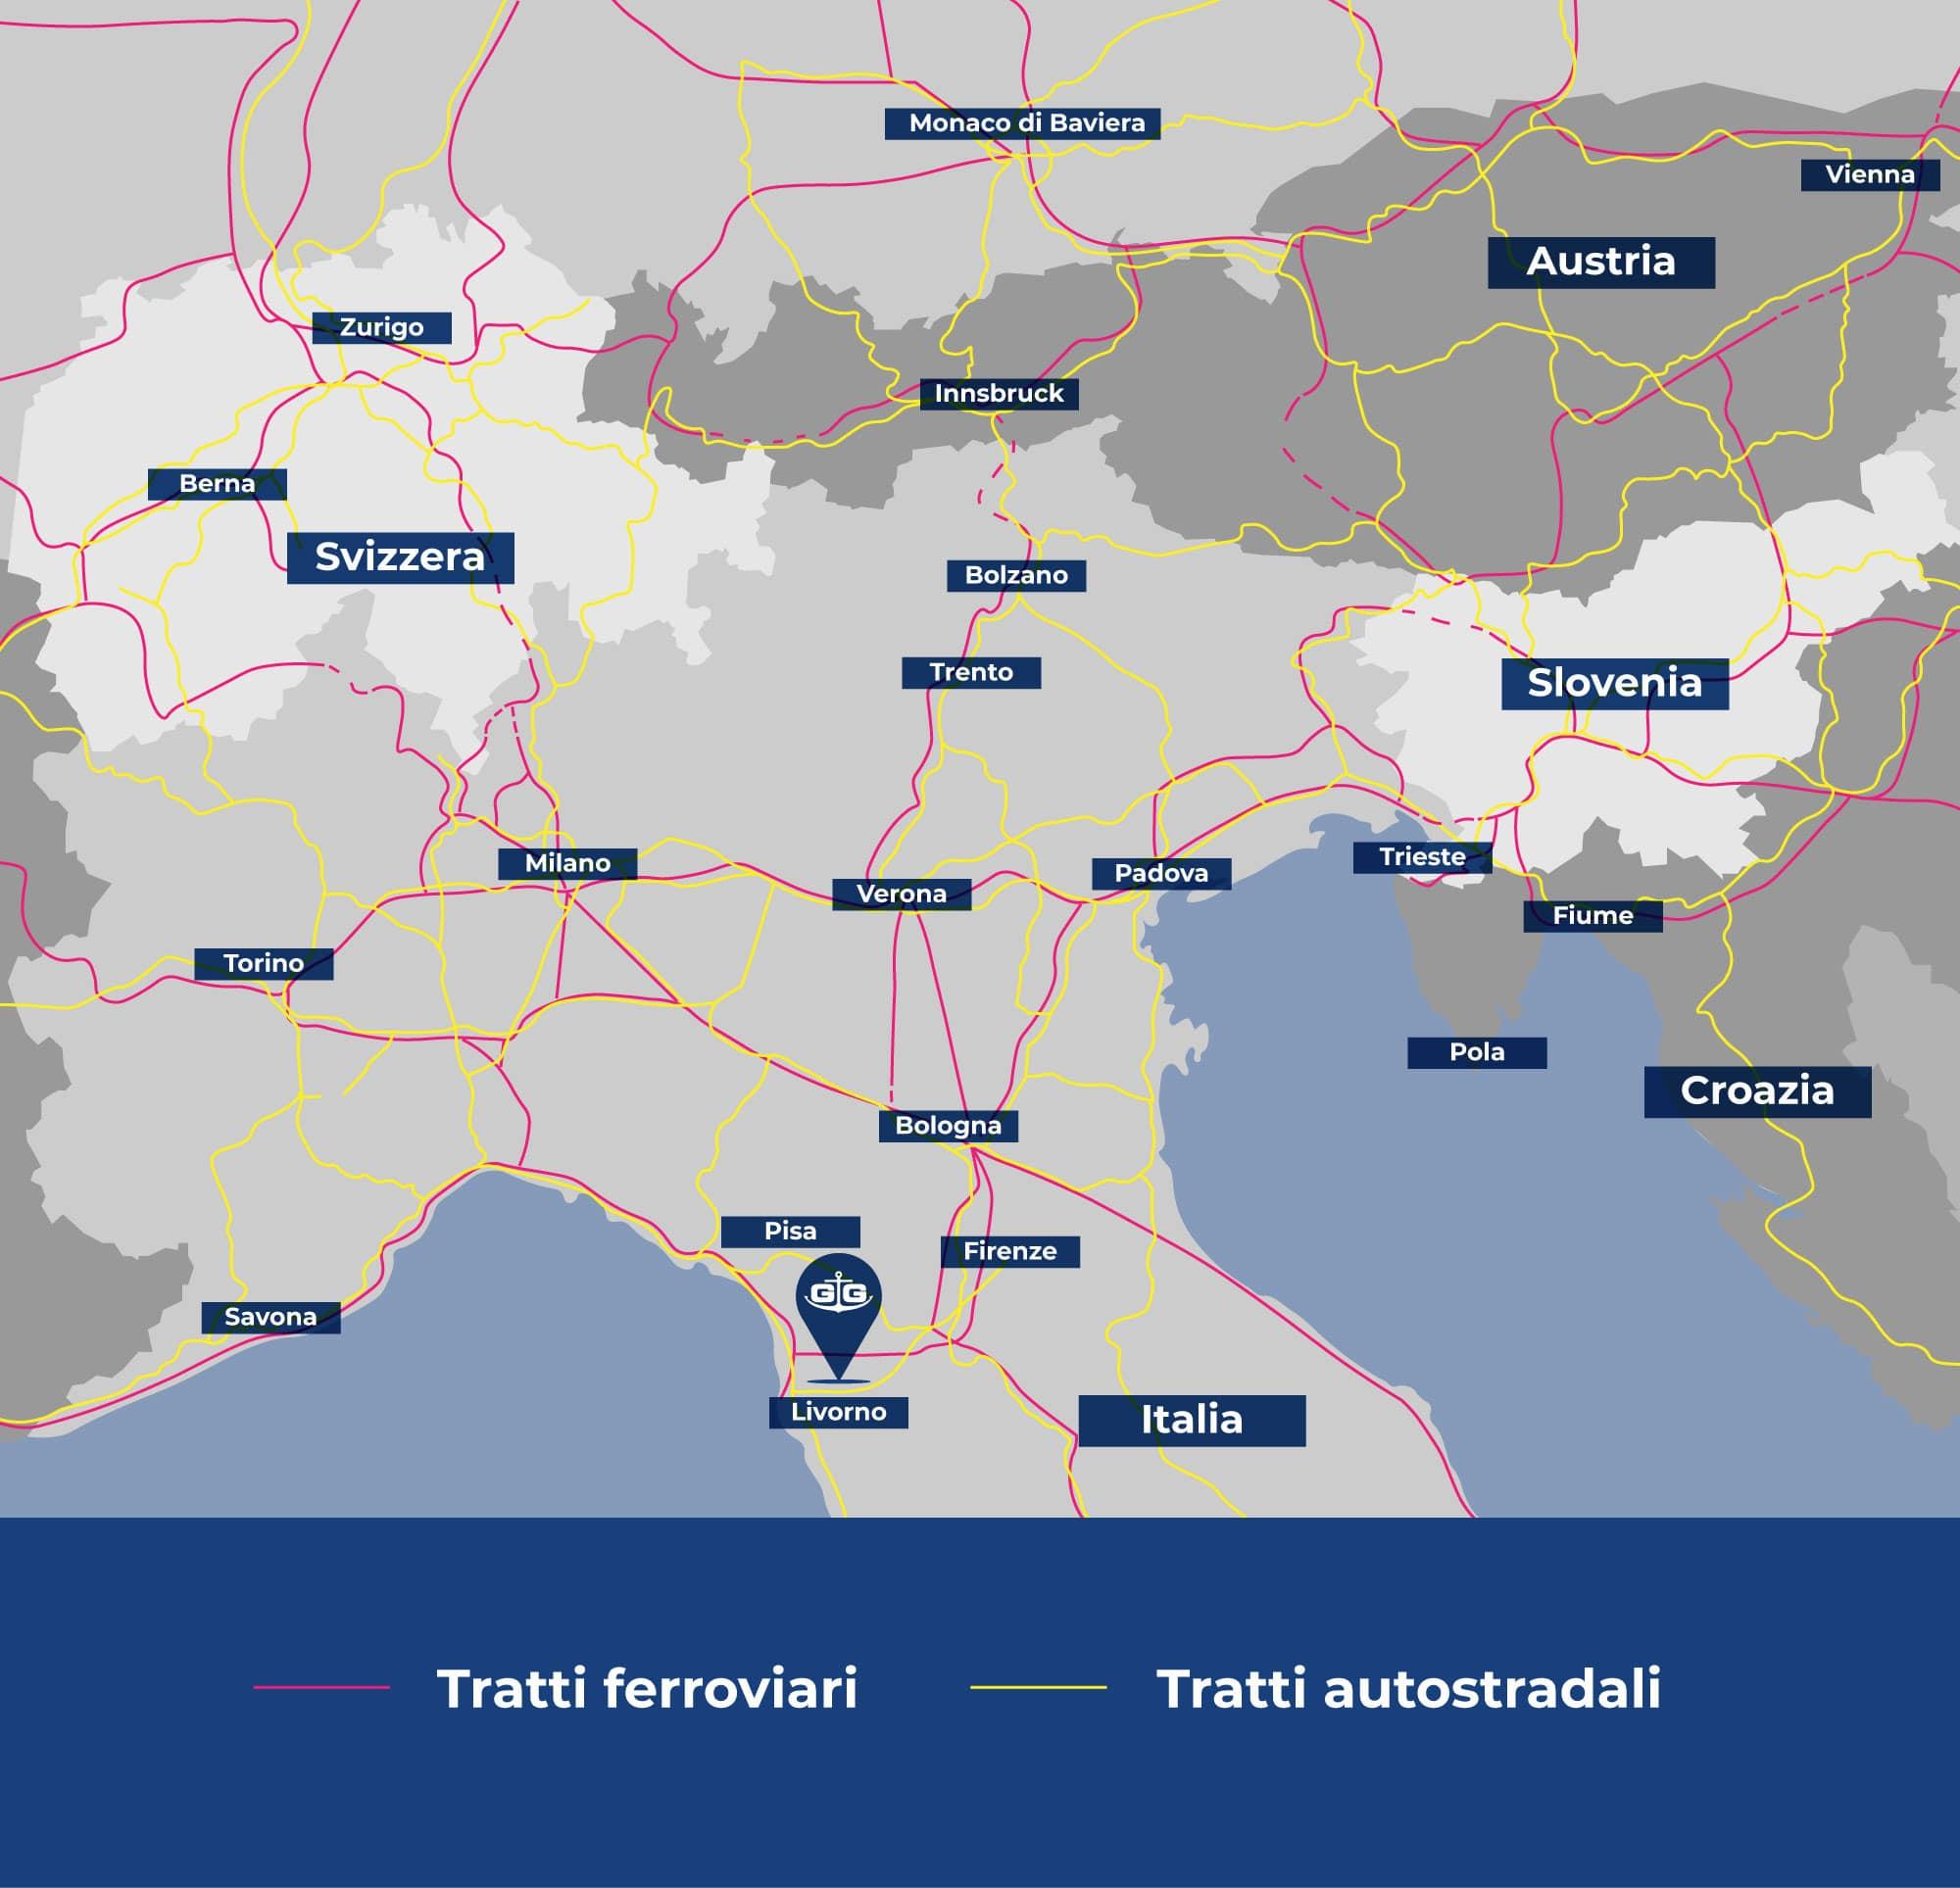 https://www.gragnani.it/wp-content/uploads/2021/08/Mappa-Autostrada.jpg